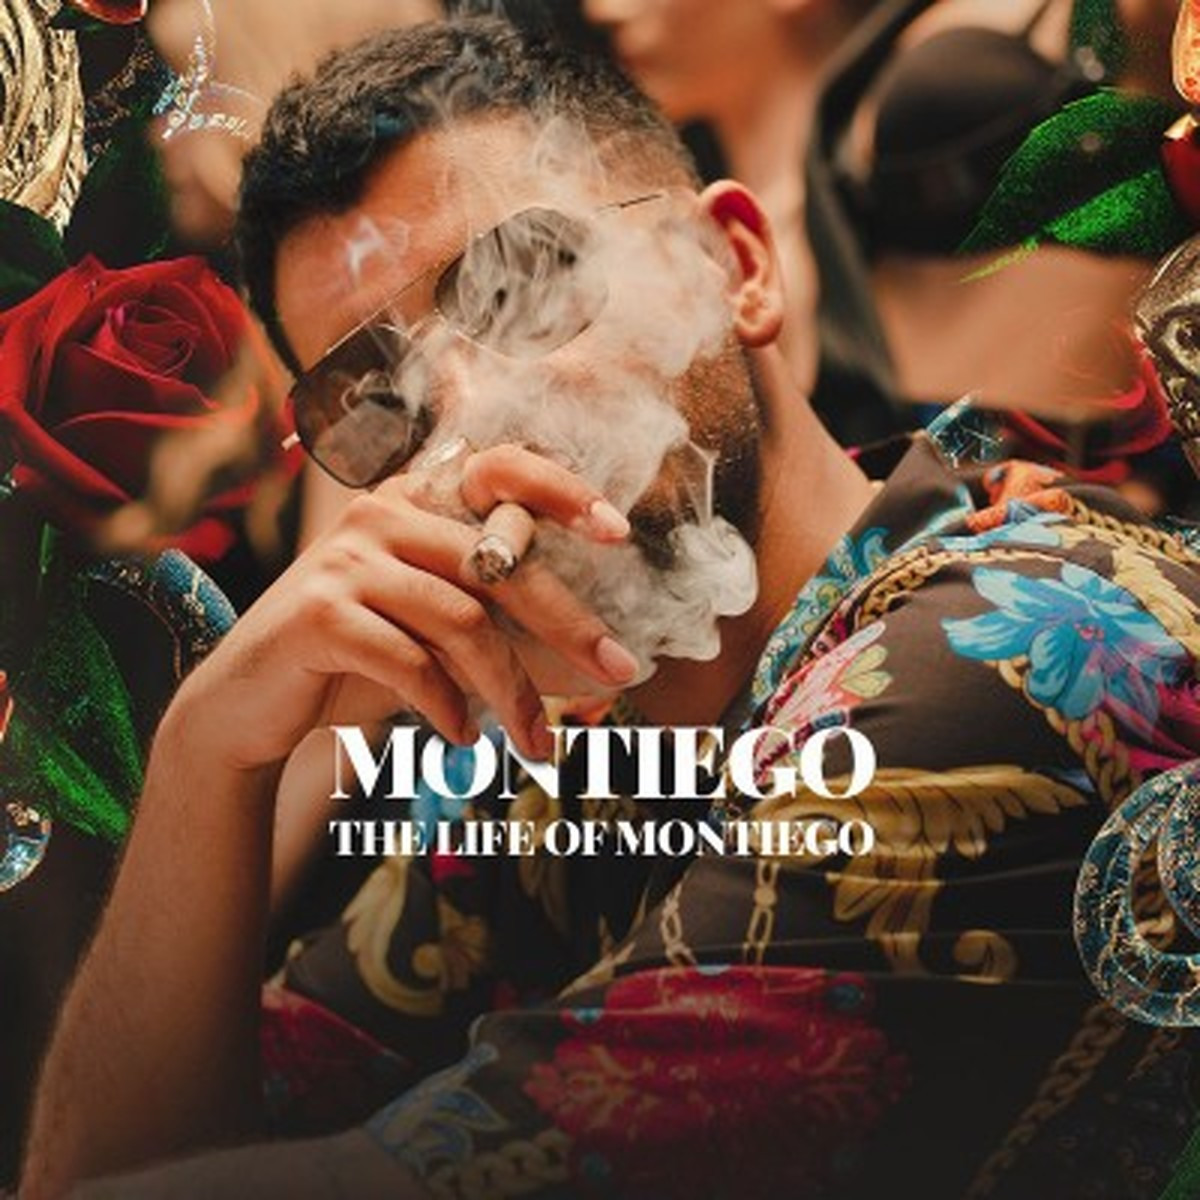 مونتیگو را بشناسید